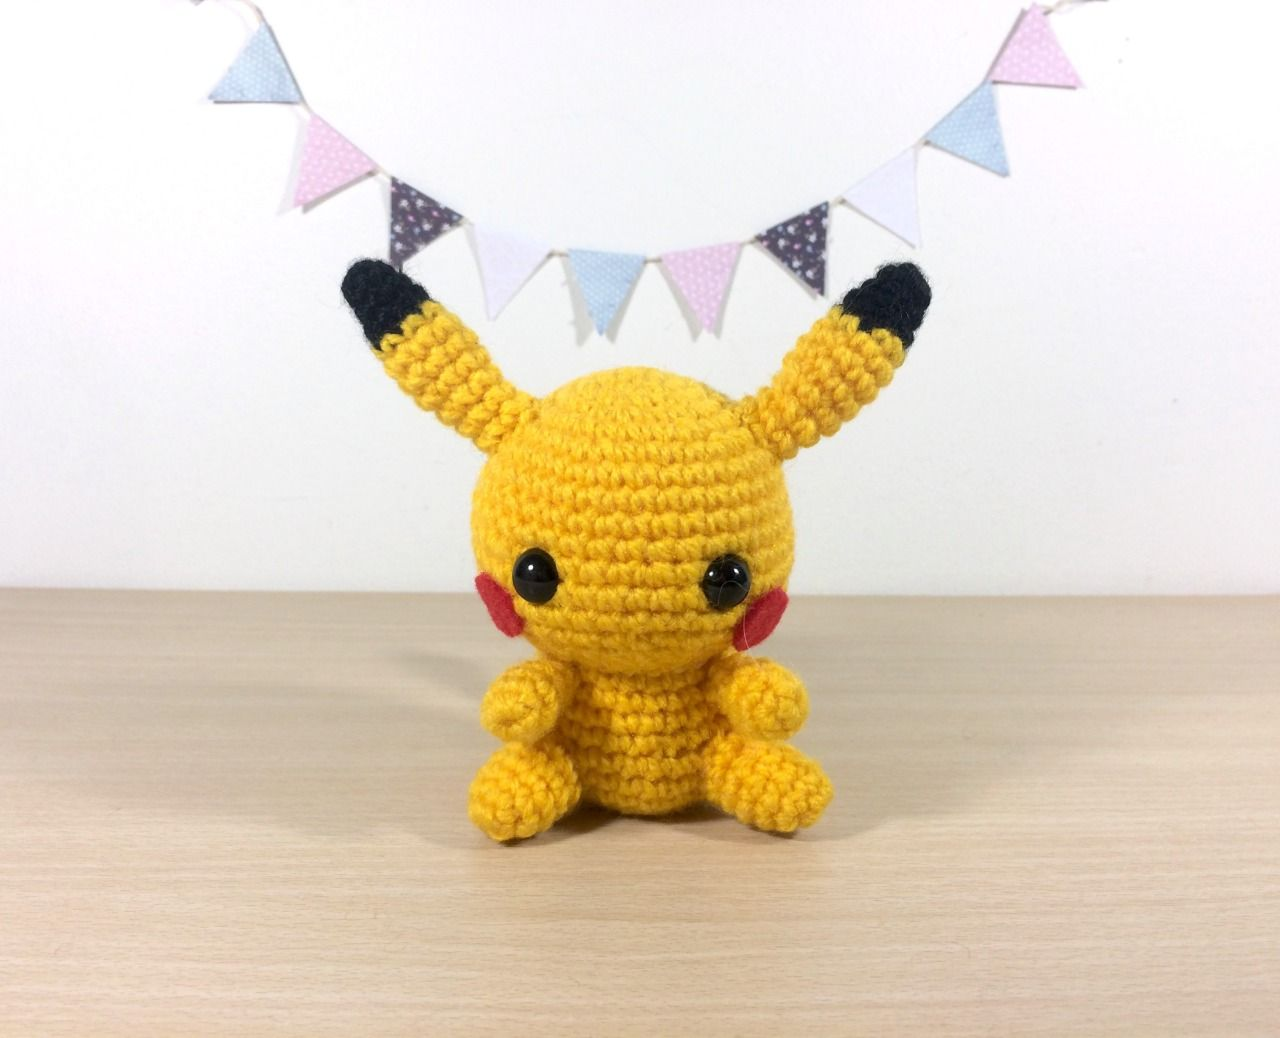 Pikachu - Pokemon Character - Free Amigurumi Crochet Pattern here ...